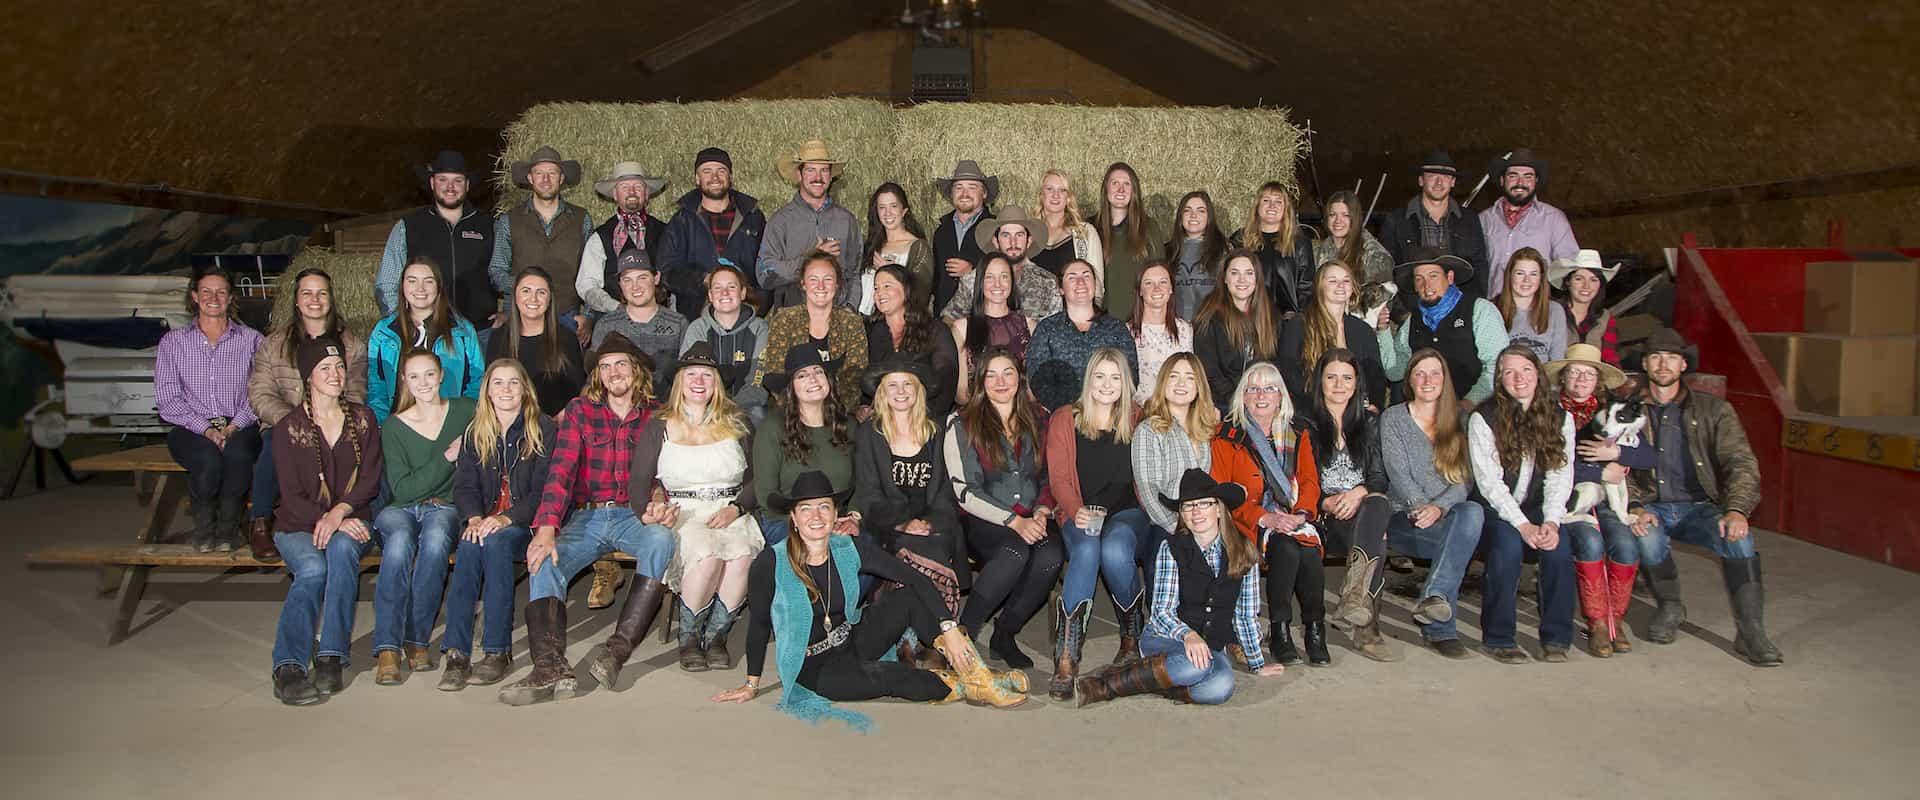 2019 Banff Trail Riders Staff Photo